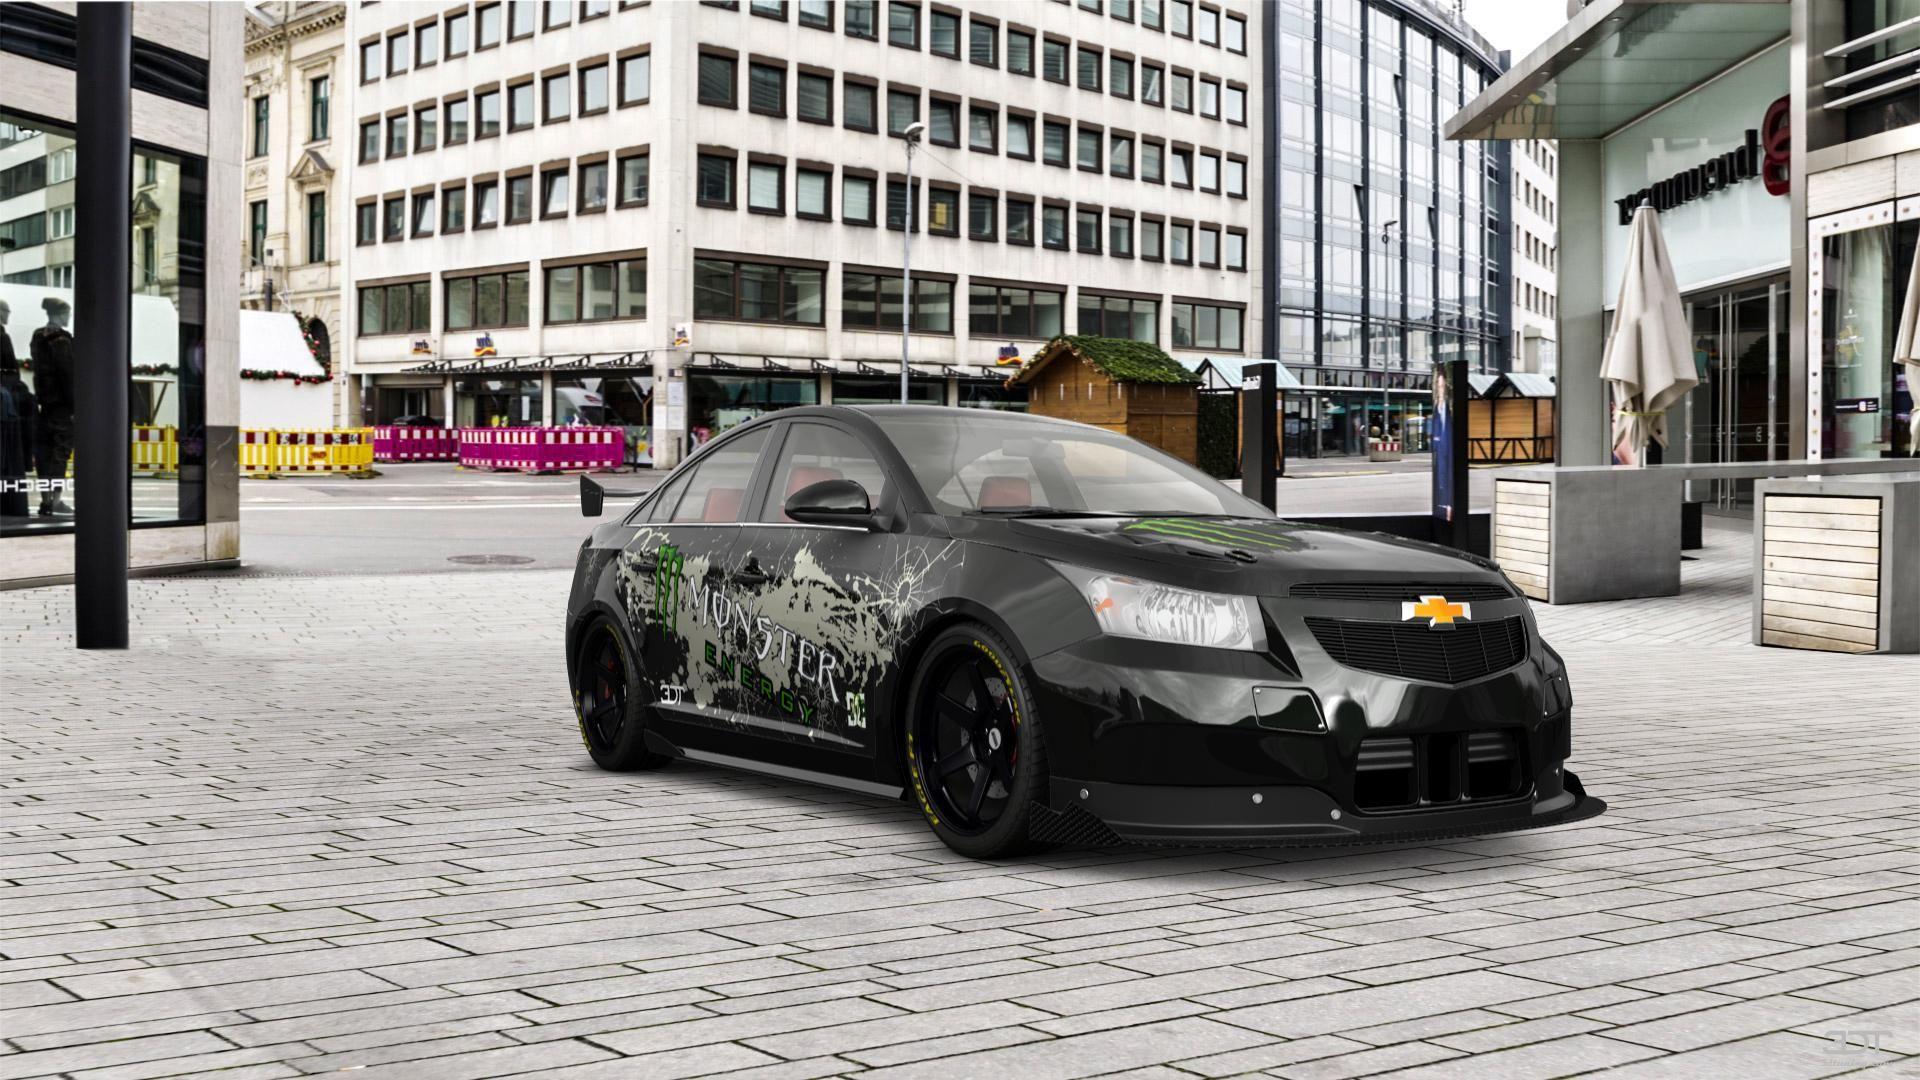 Chevrolet Cruze Tuning Autos